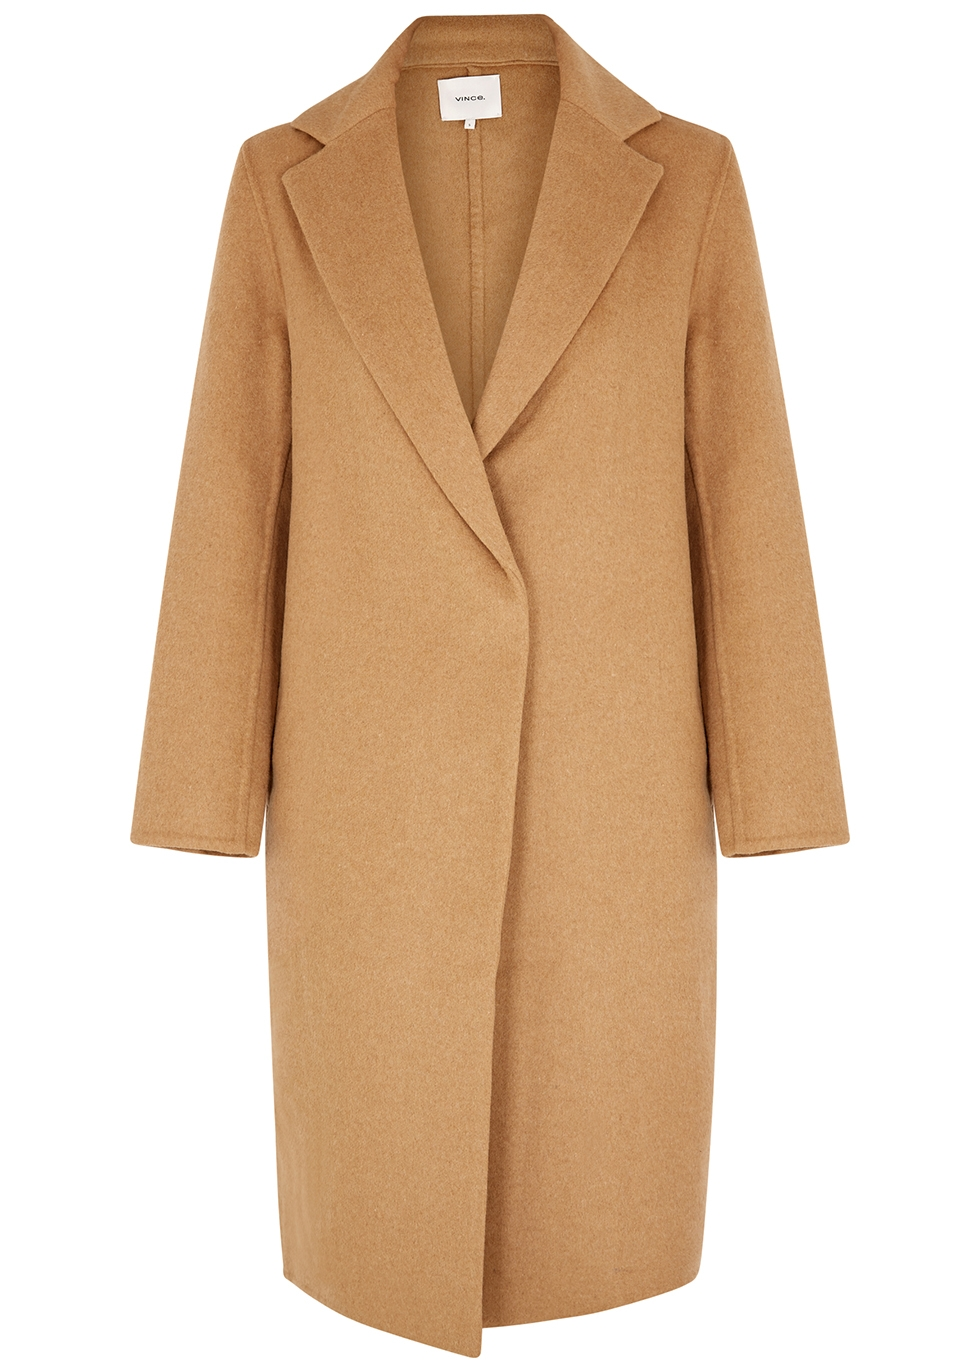 Classic camel wool-blend coat